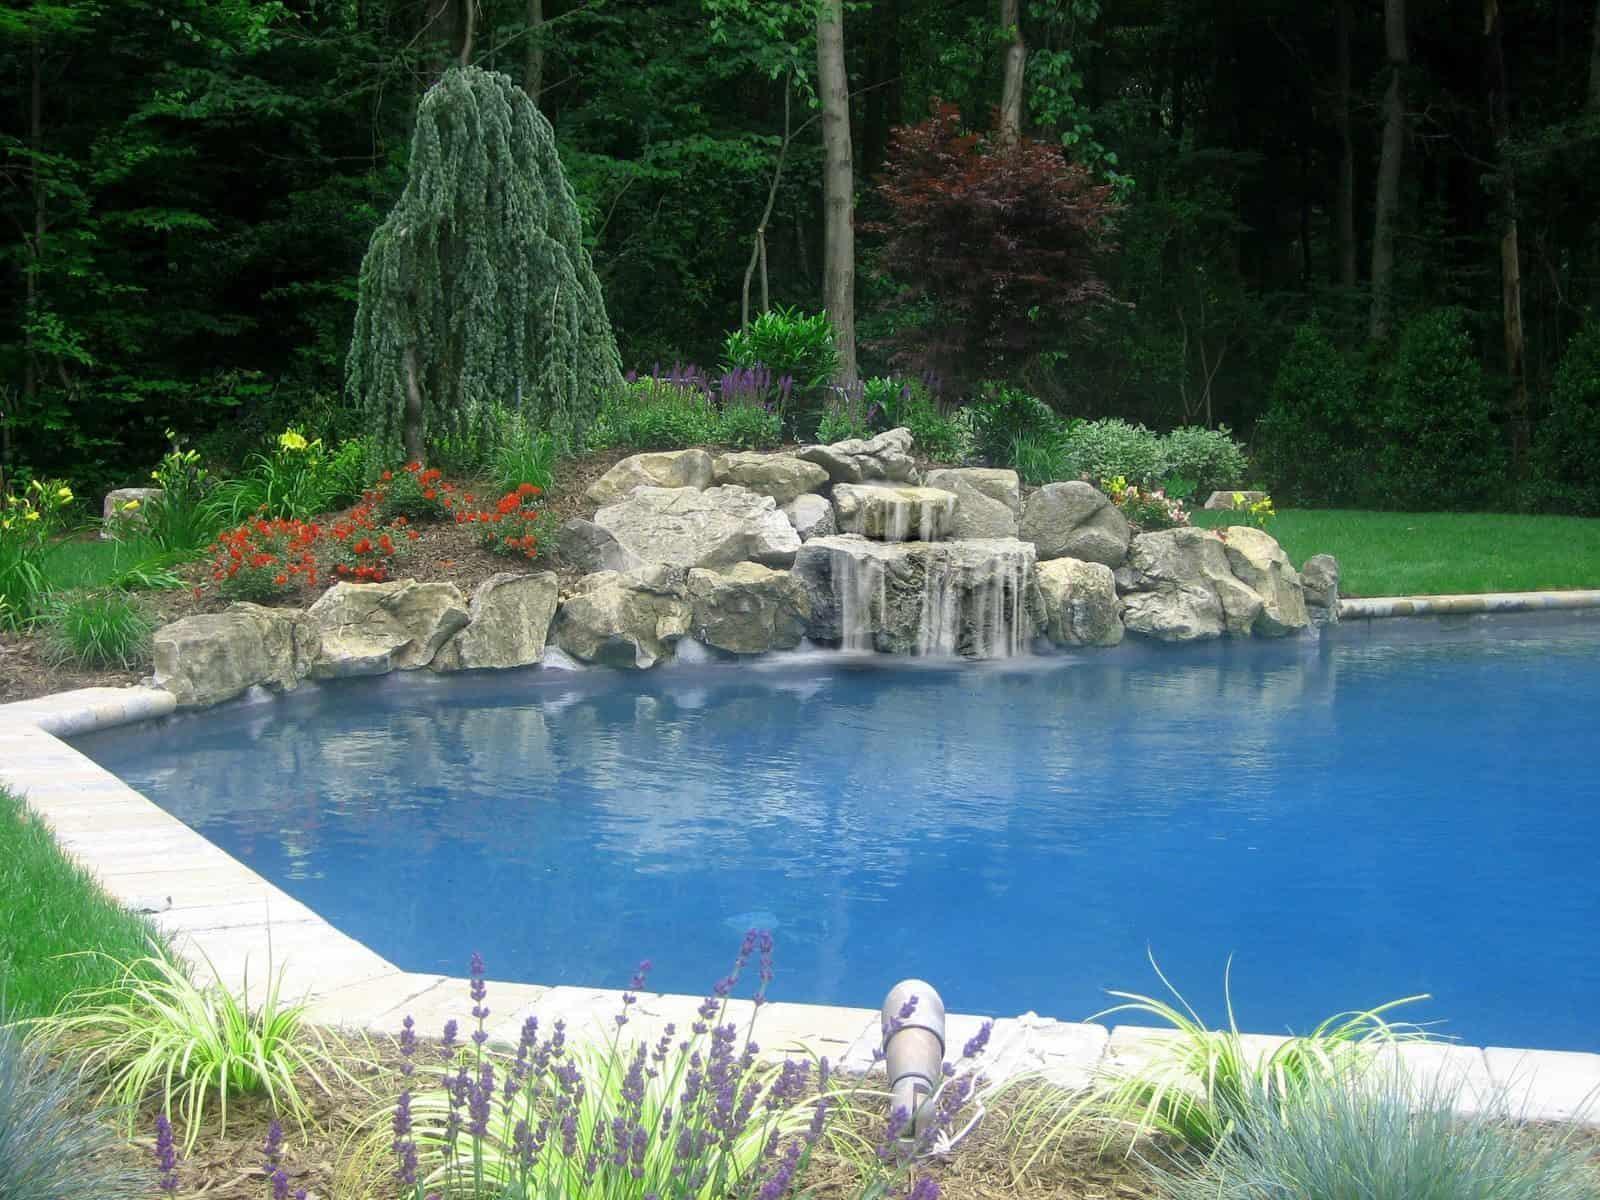 18' x 36' Elbow shaped Gunite Pool - Dix Hills, Long Island NY